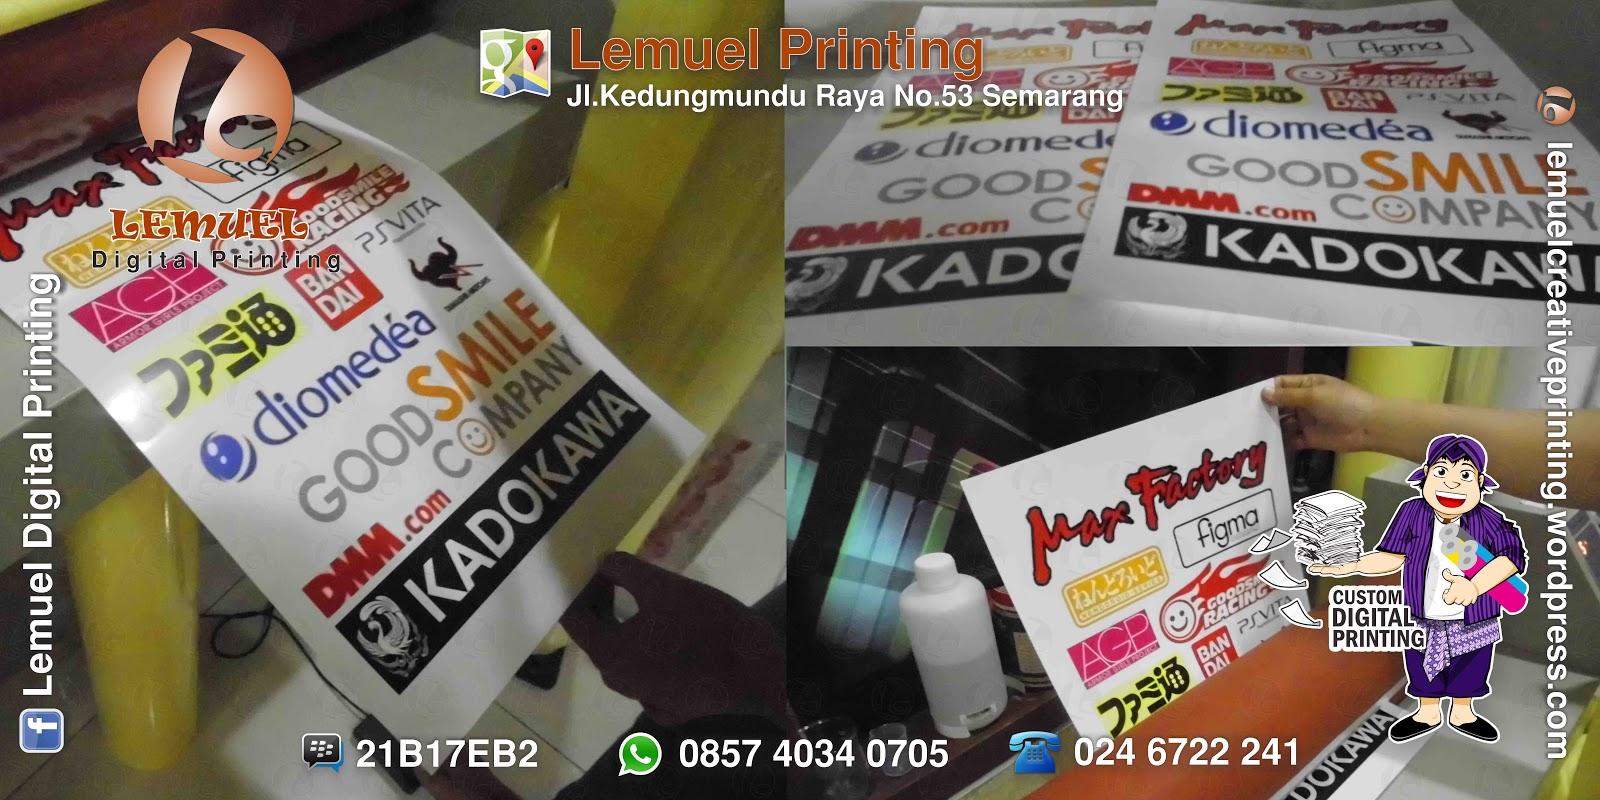 Sticker digital apparel digital dan aneka produk kreatif berbasis